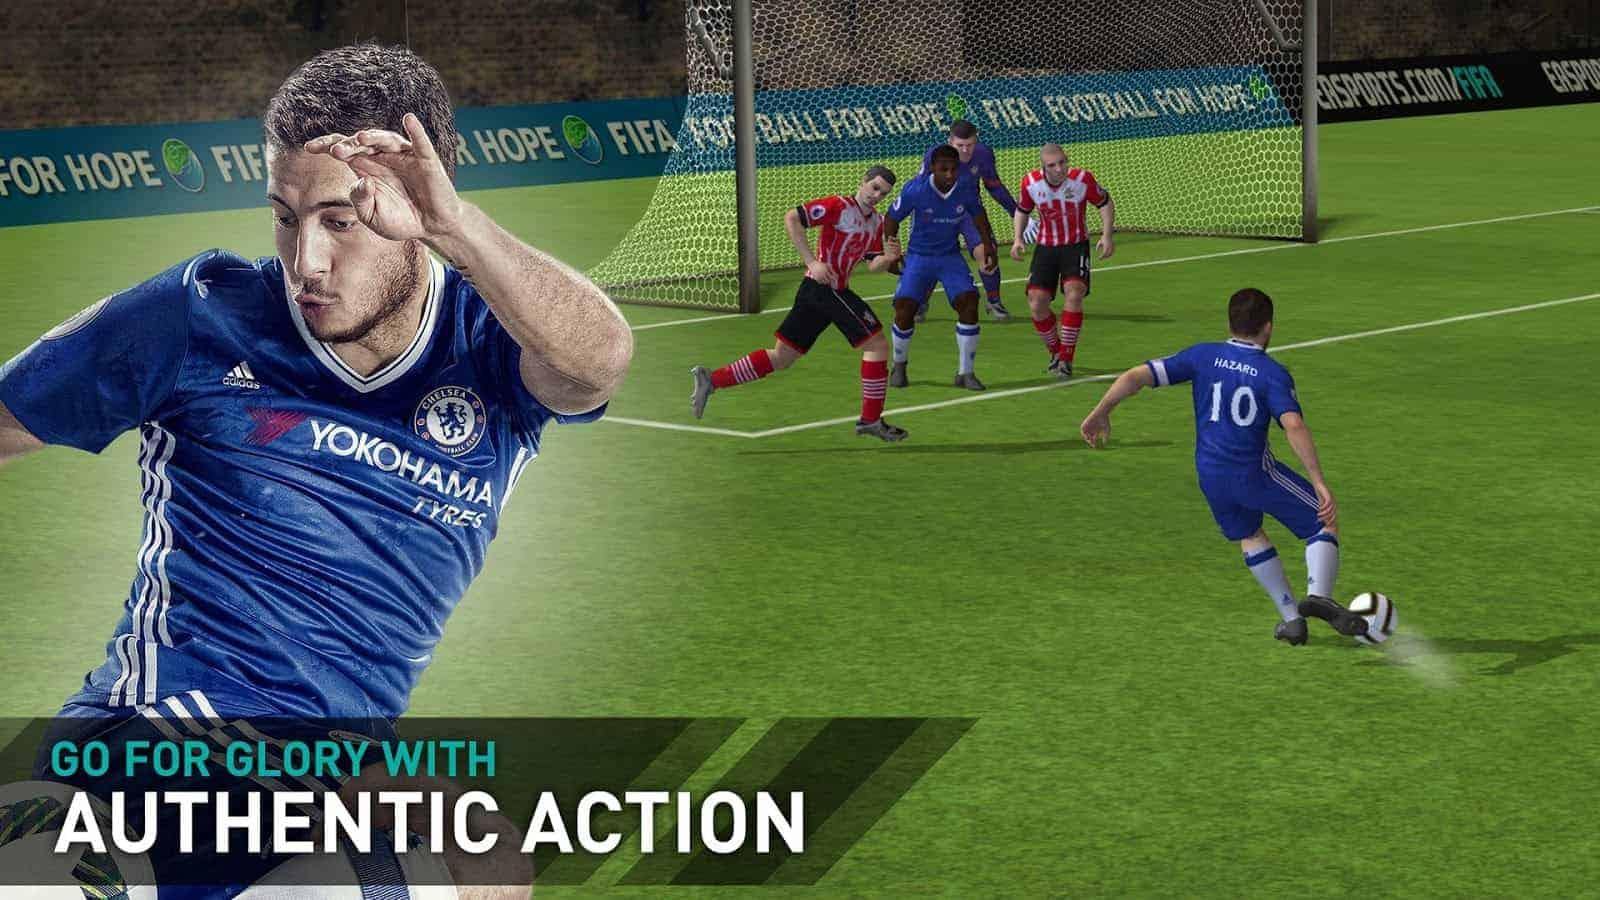 FIFA Mobile Soccer APK 10.6.00 games